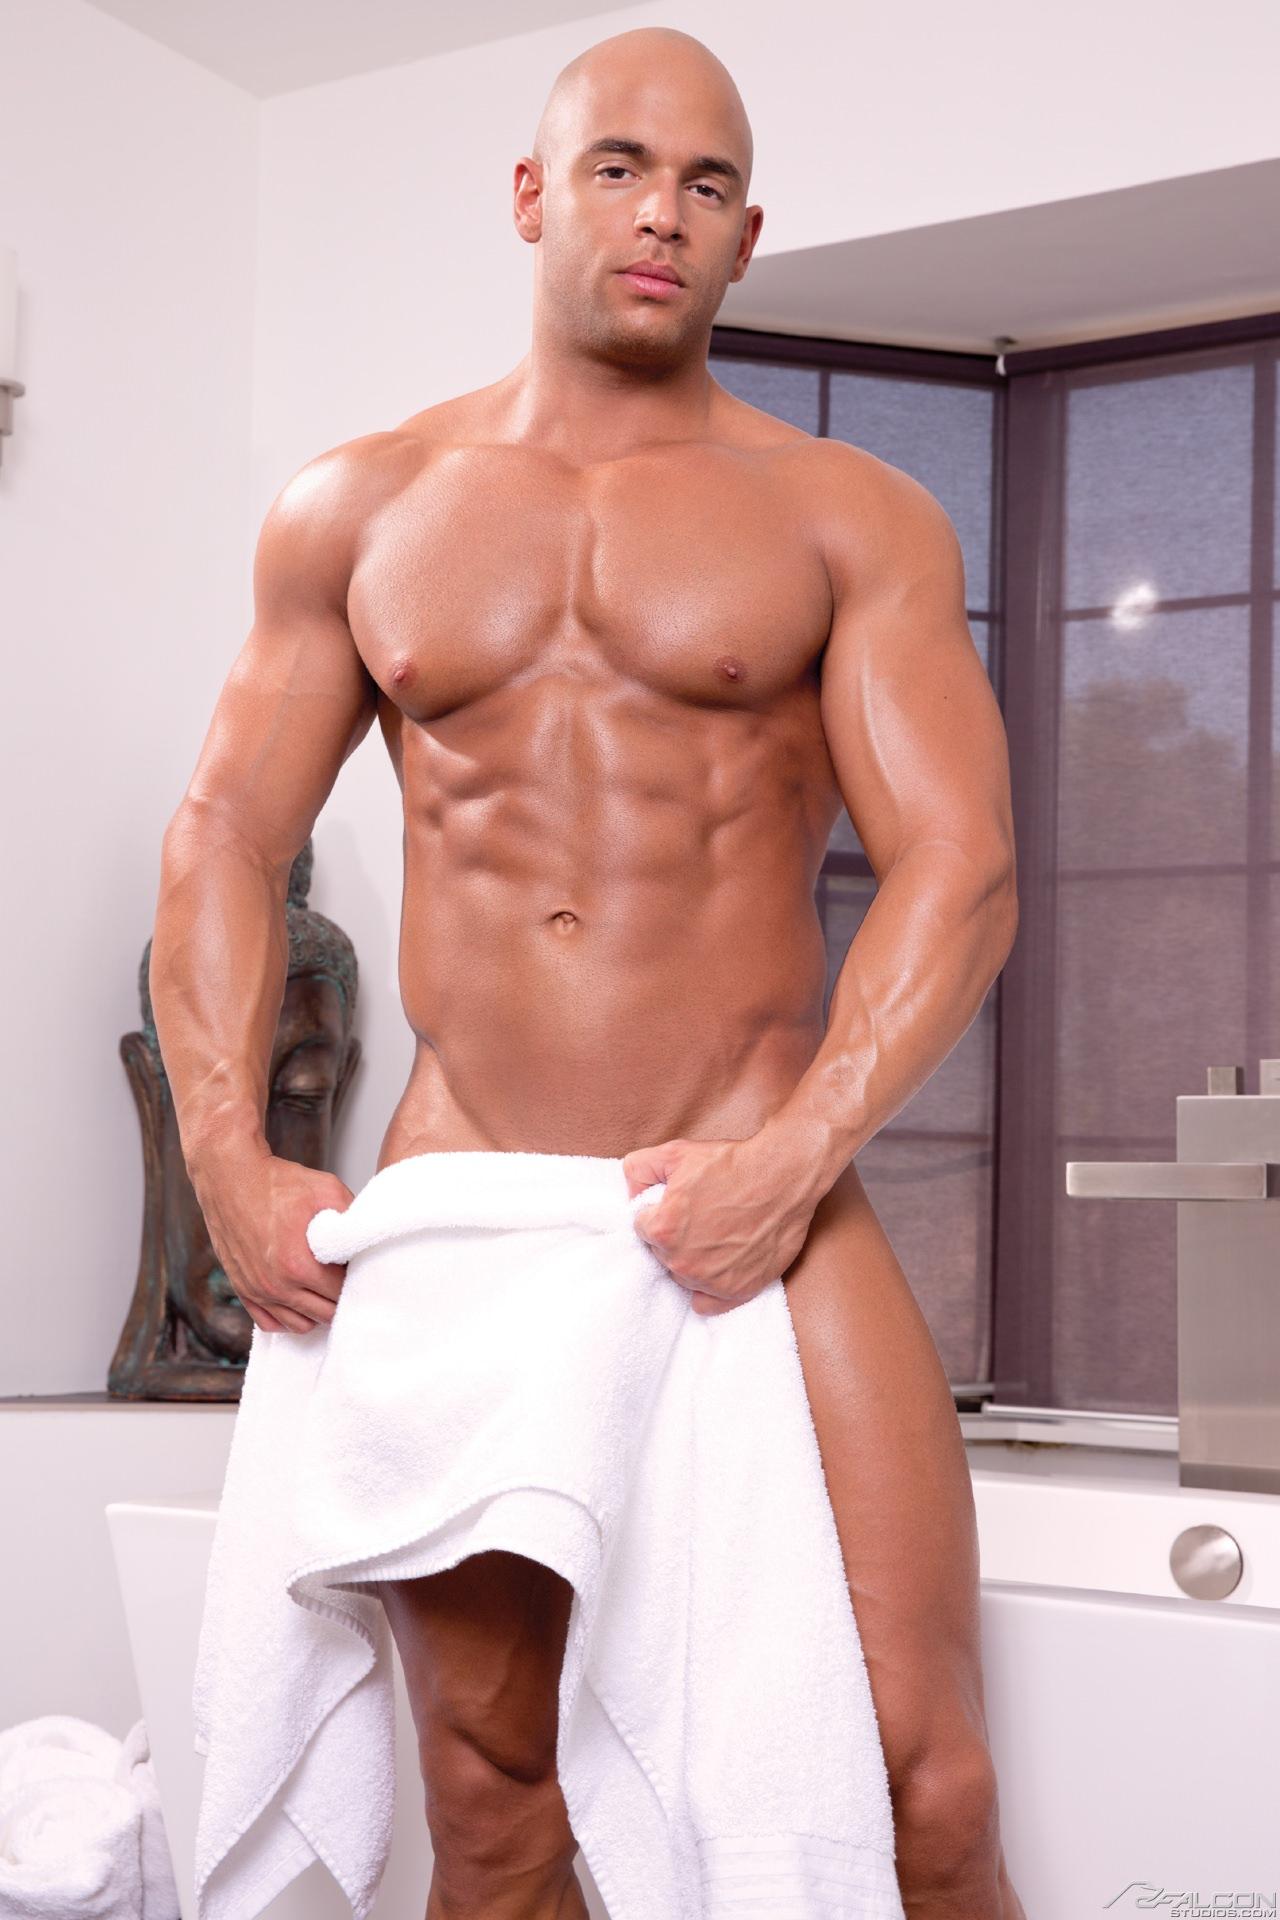 Coco austin leaked nude photos